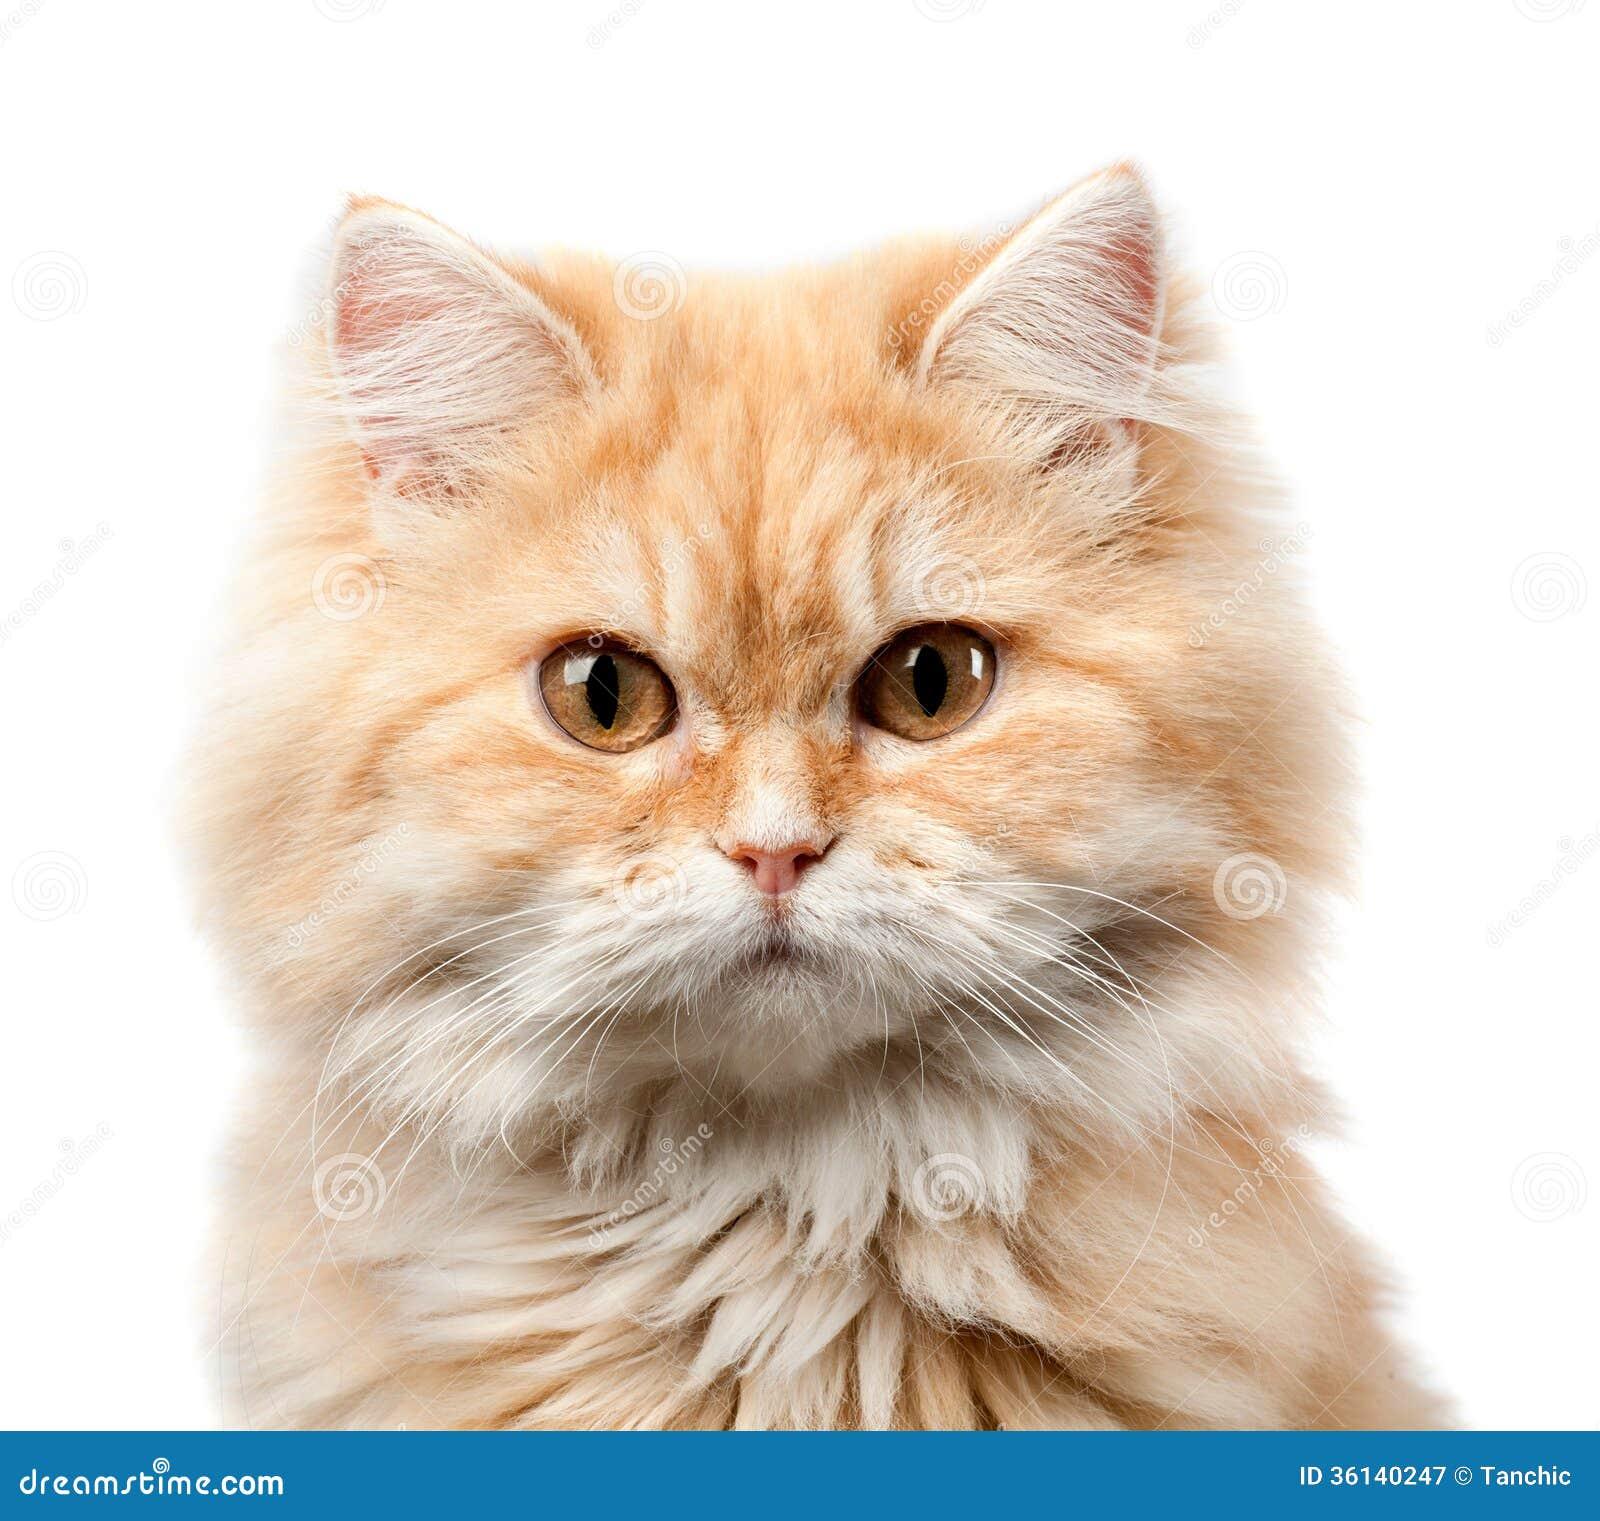 Redhead hairy cat portrait